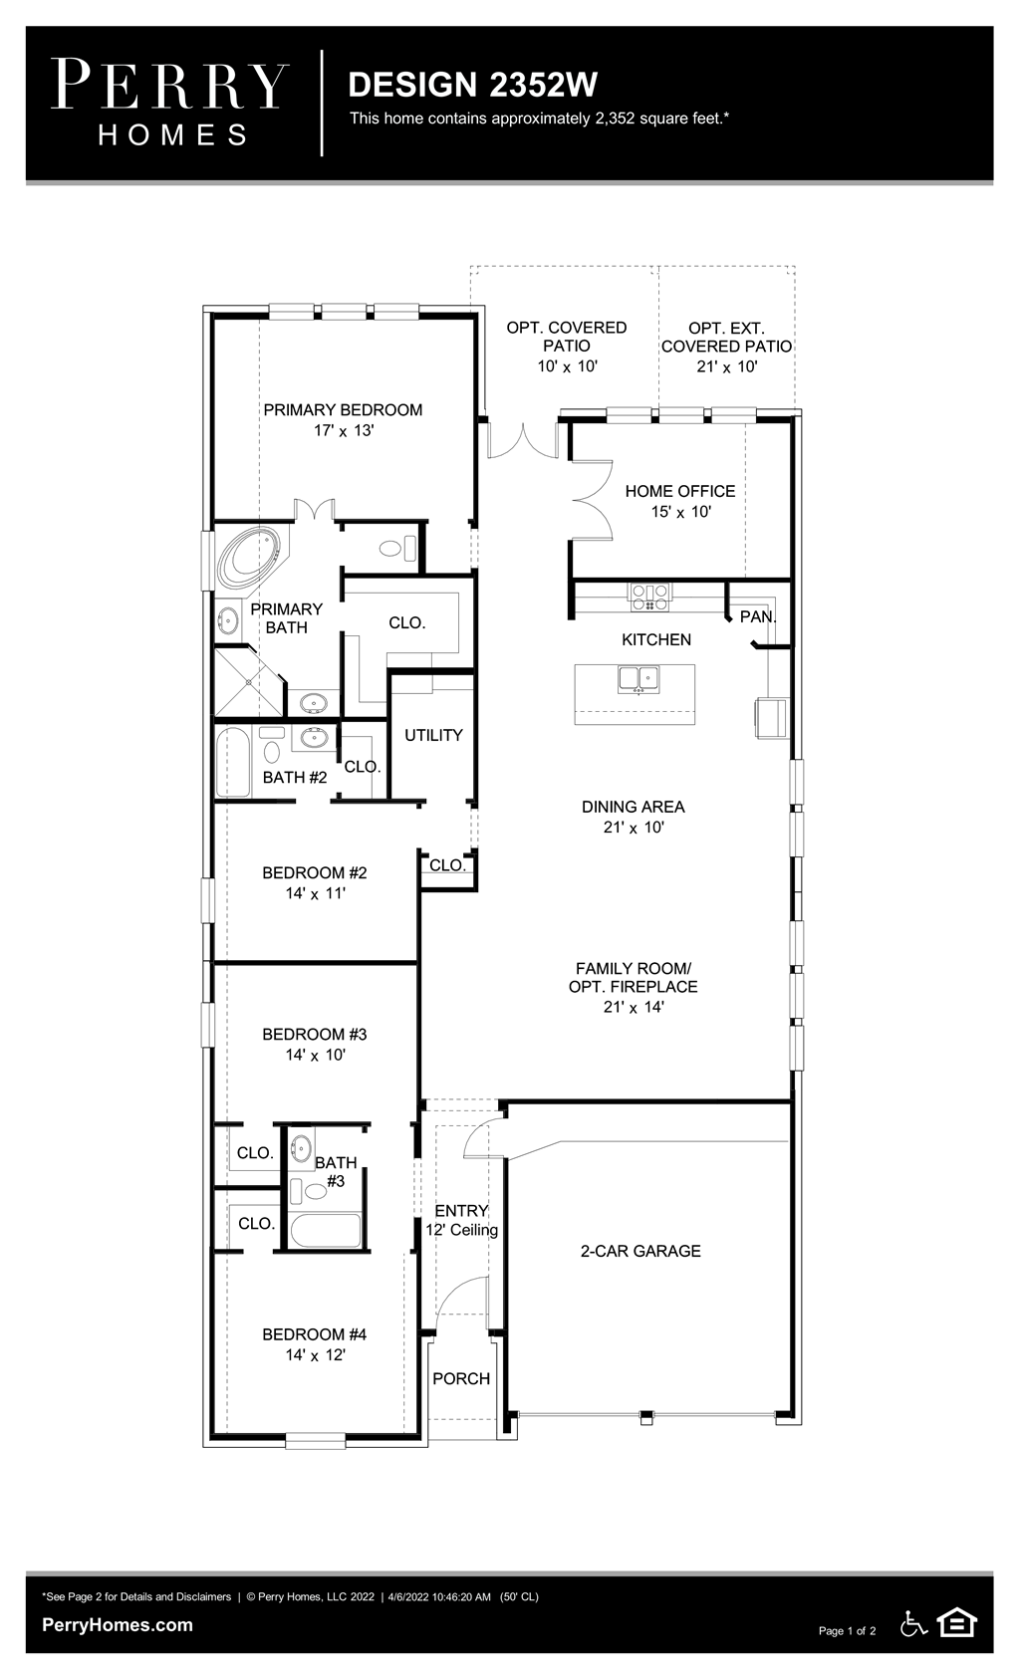 Floor Plan for 2352W